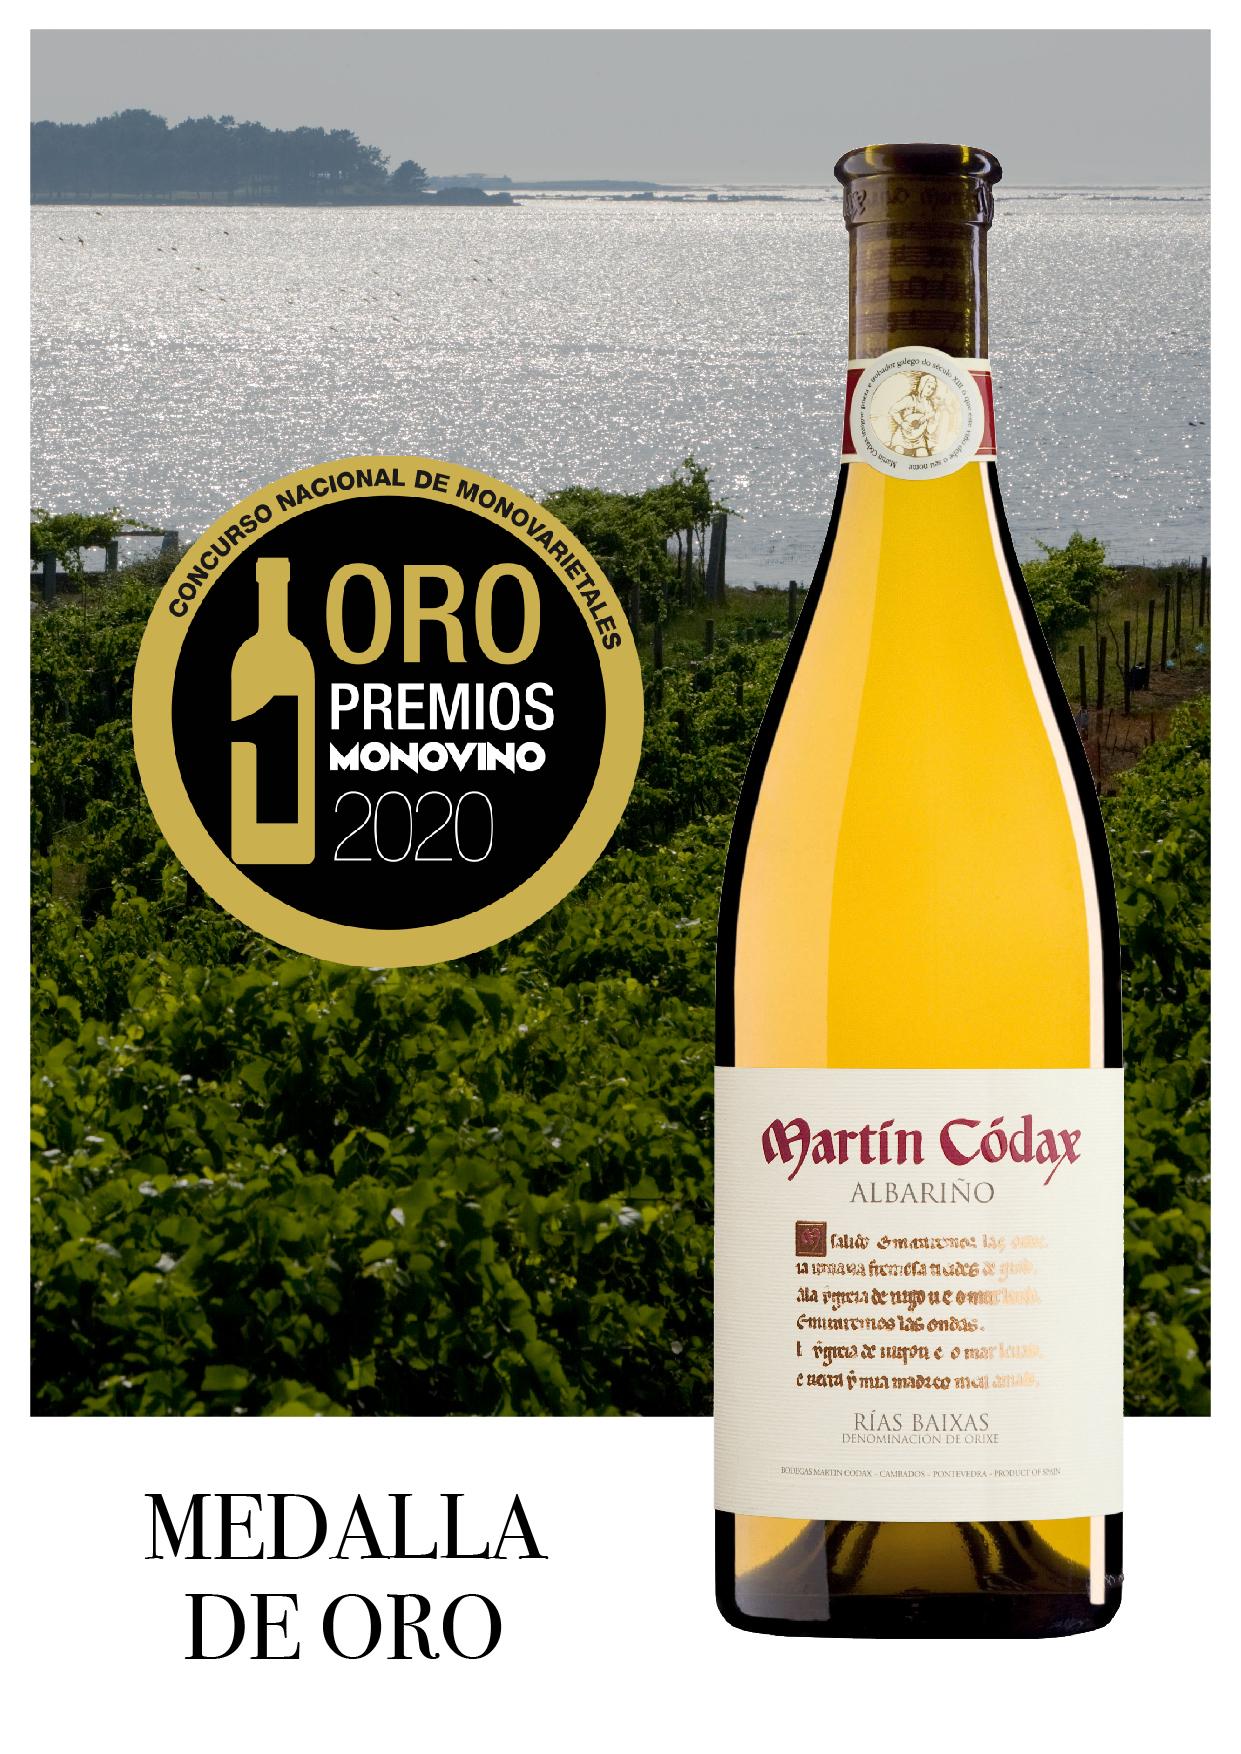 Premios-monovino_Oro-05